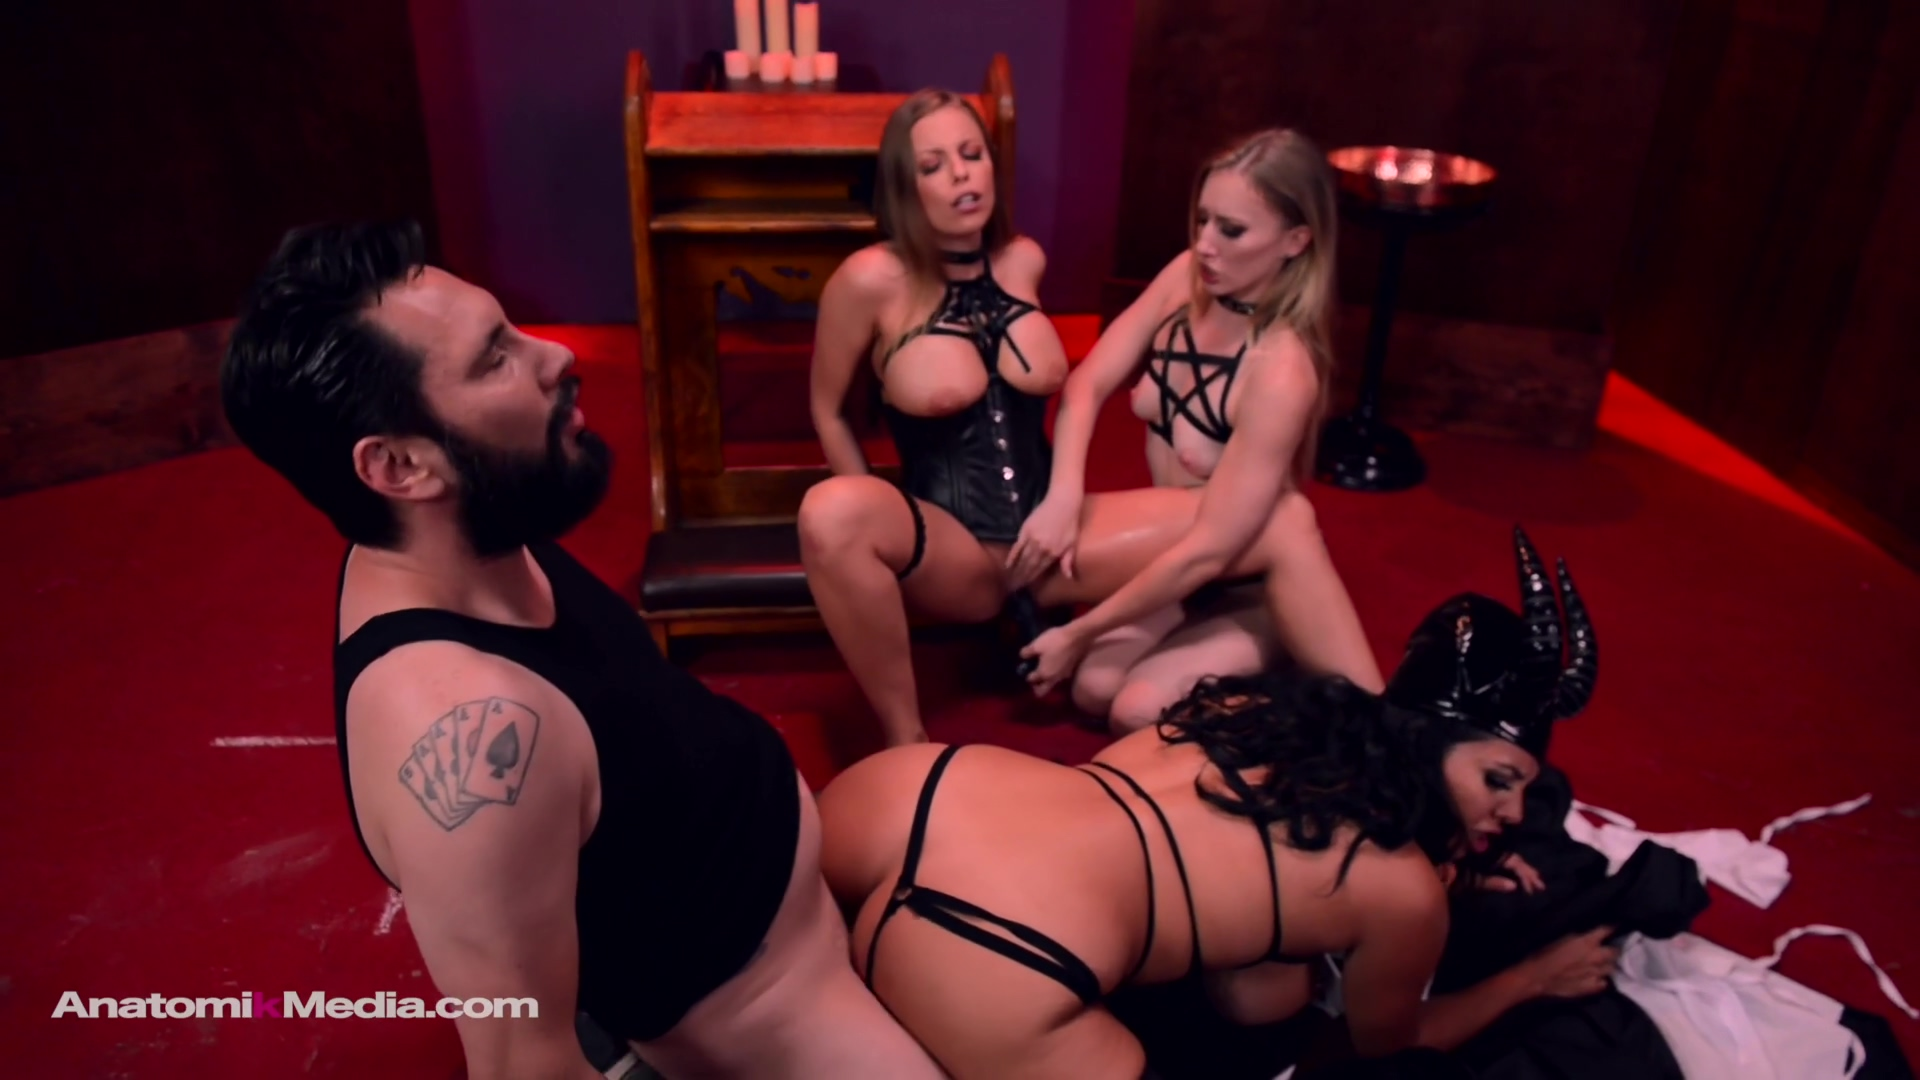 Video 1538752904: riley reyes, britney amber, missy martinez, blonde milf anal sex, tits blonde milf anal, big tits milf anal, milf anal hd blonde, milf anal group, big tit brunette milf